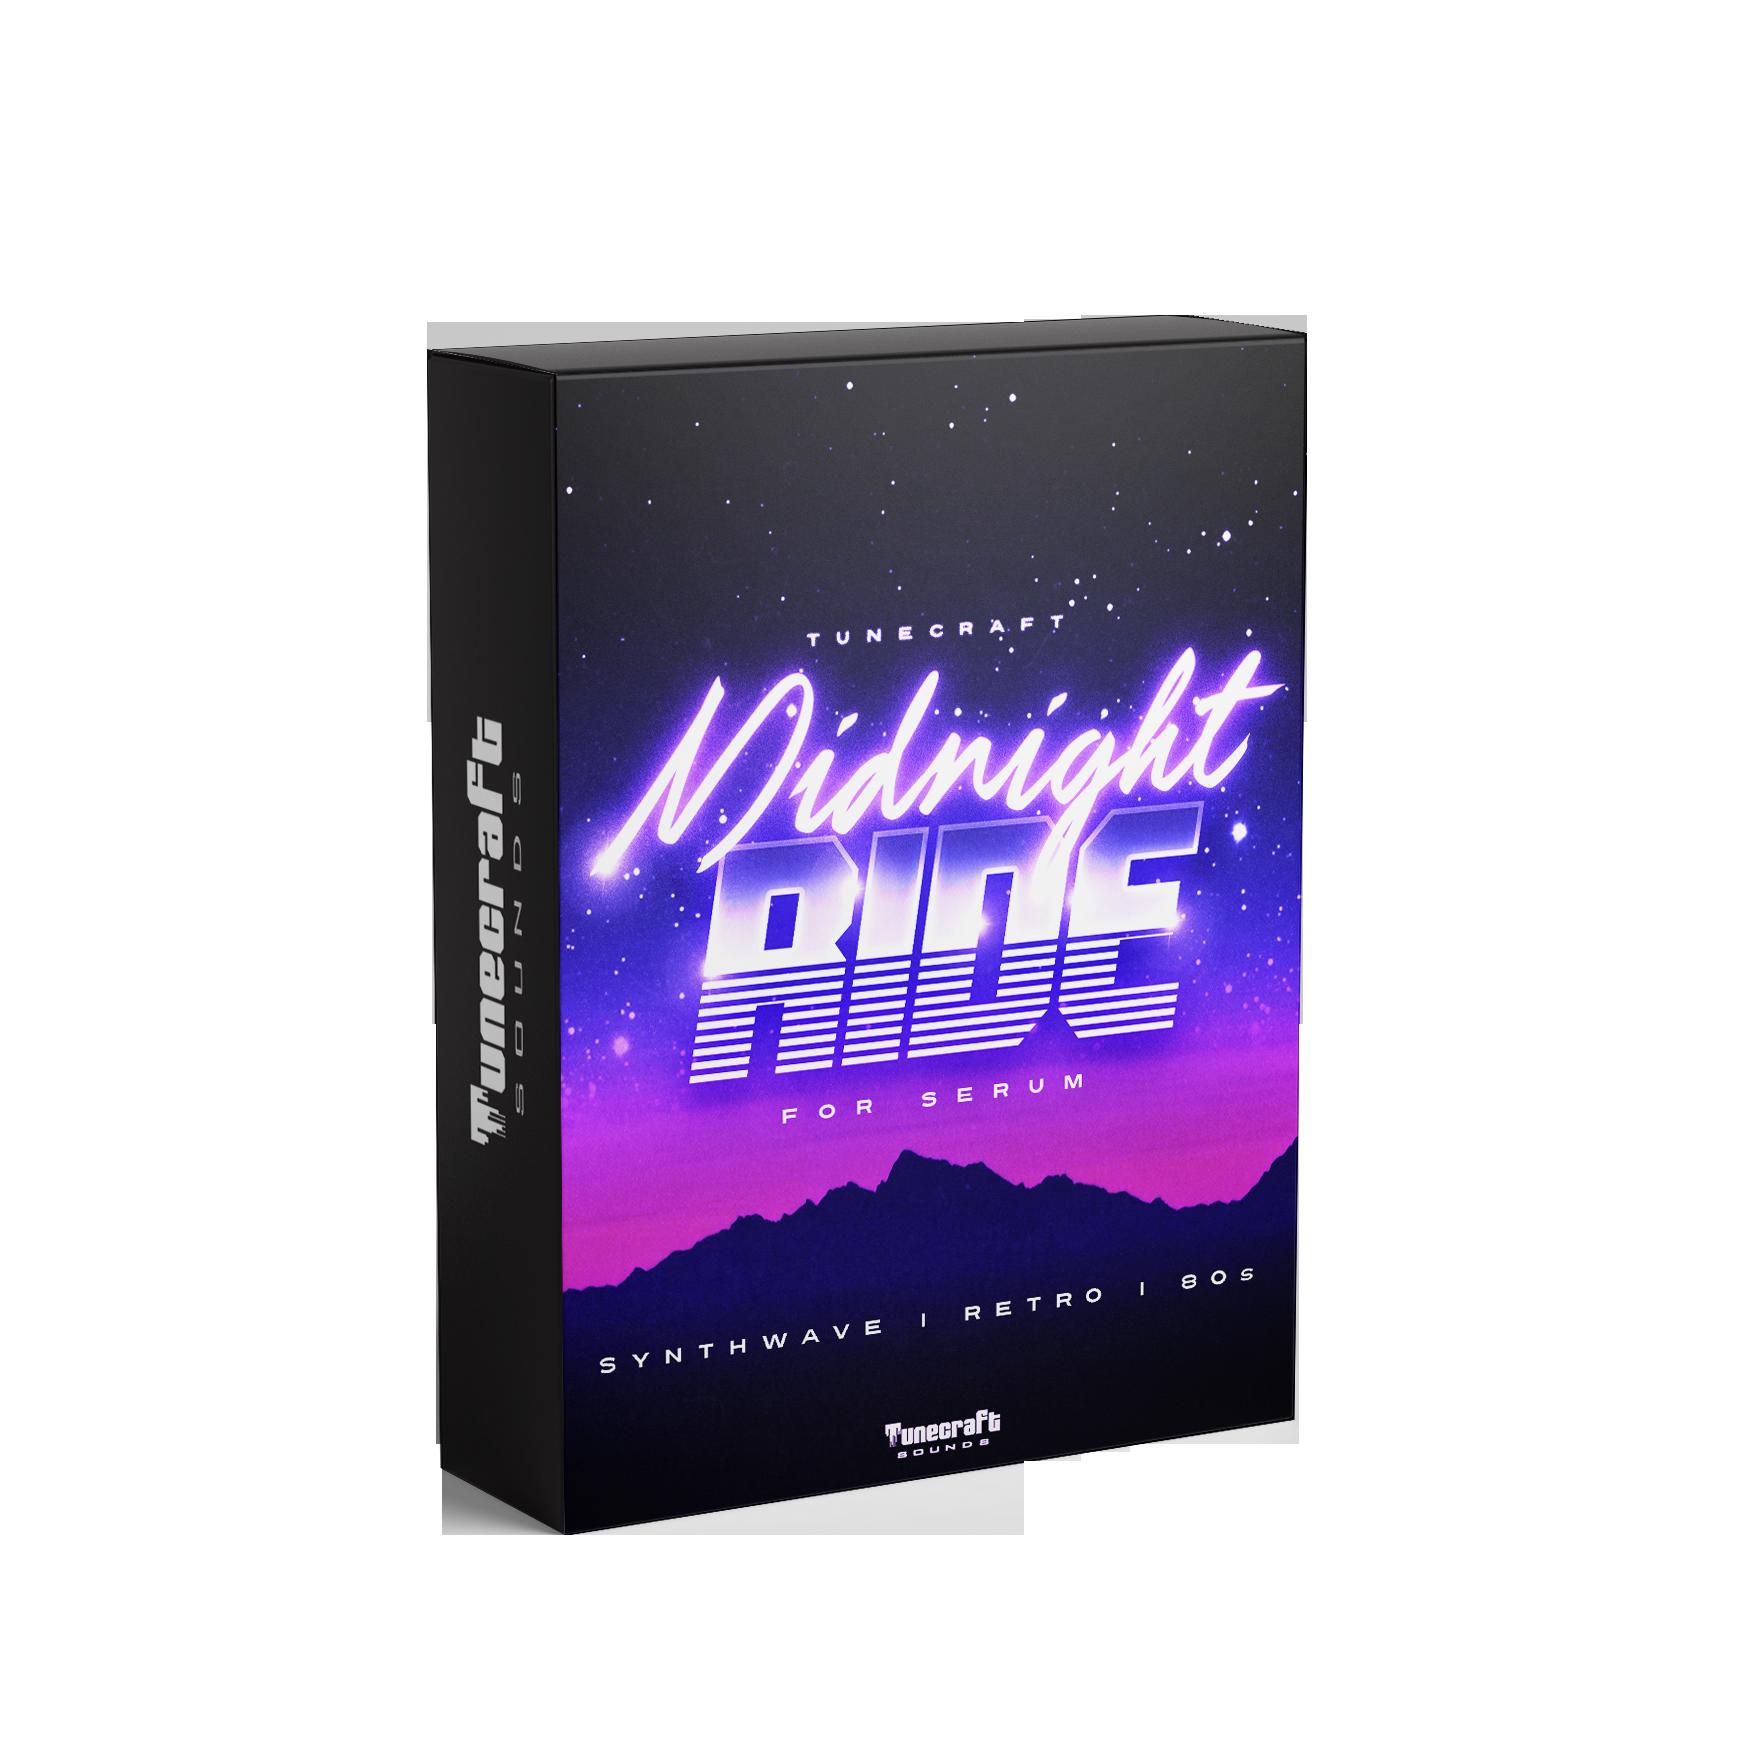 https://www.tunecraft-sounds.com/wp-content/uploads/2020/01/Midnight-Ride-3D-box-NS.png